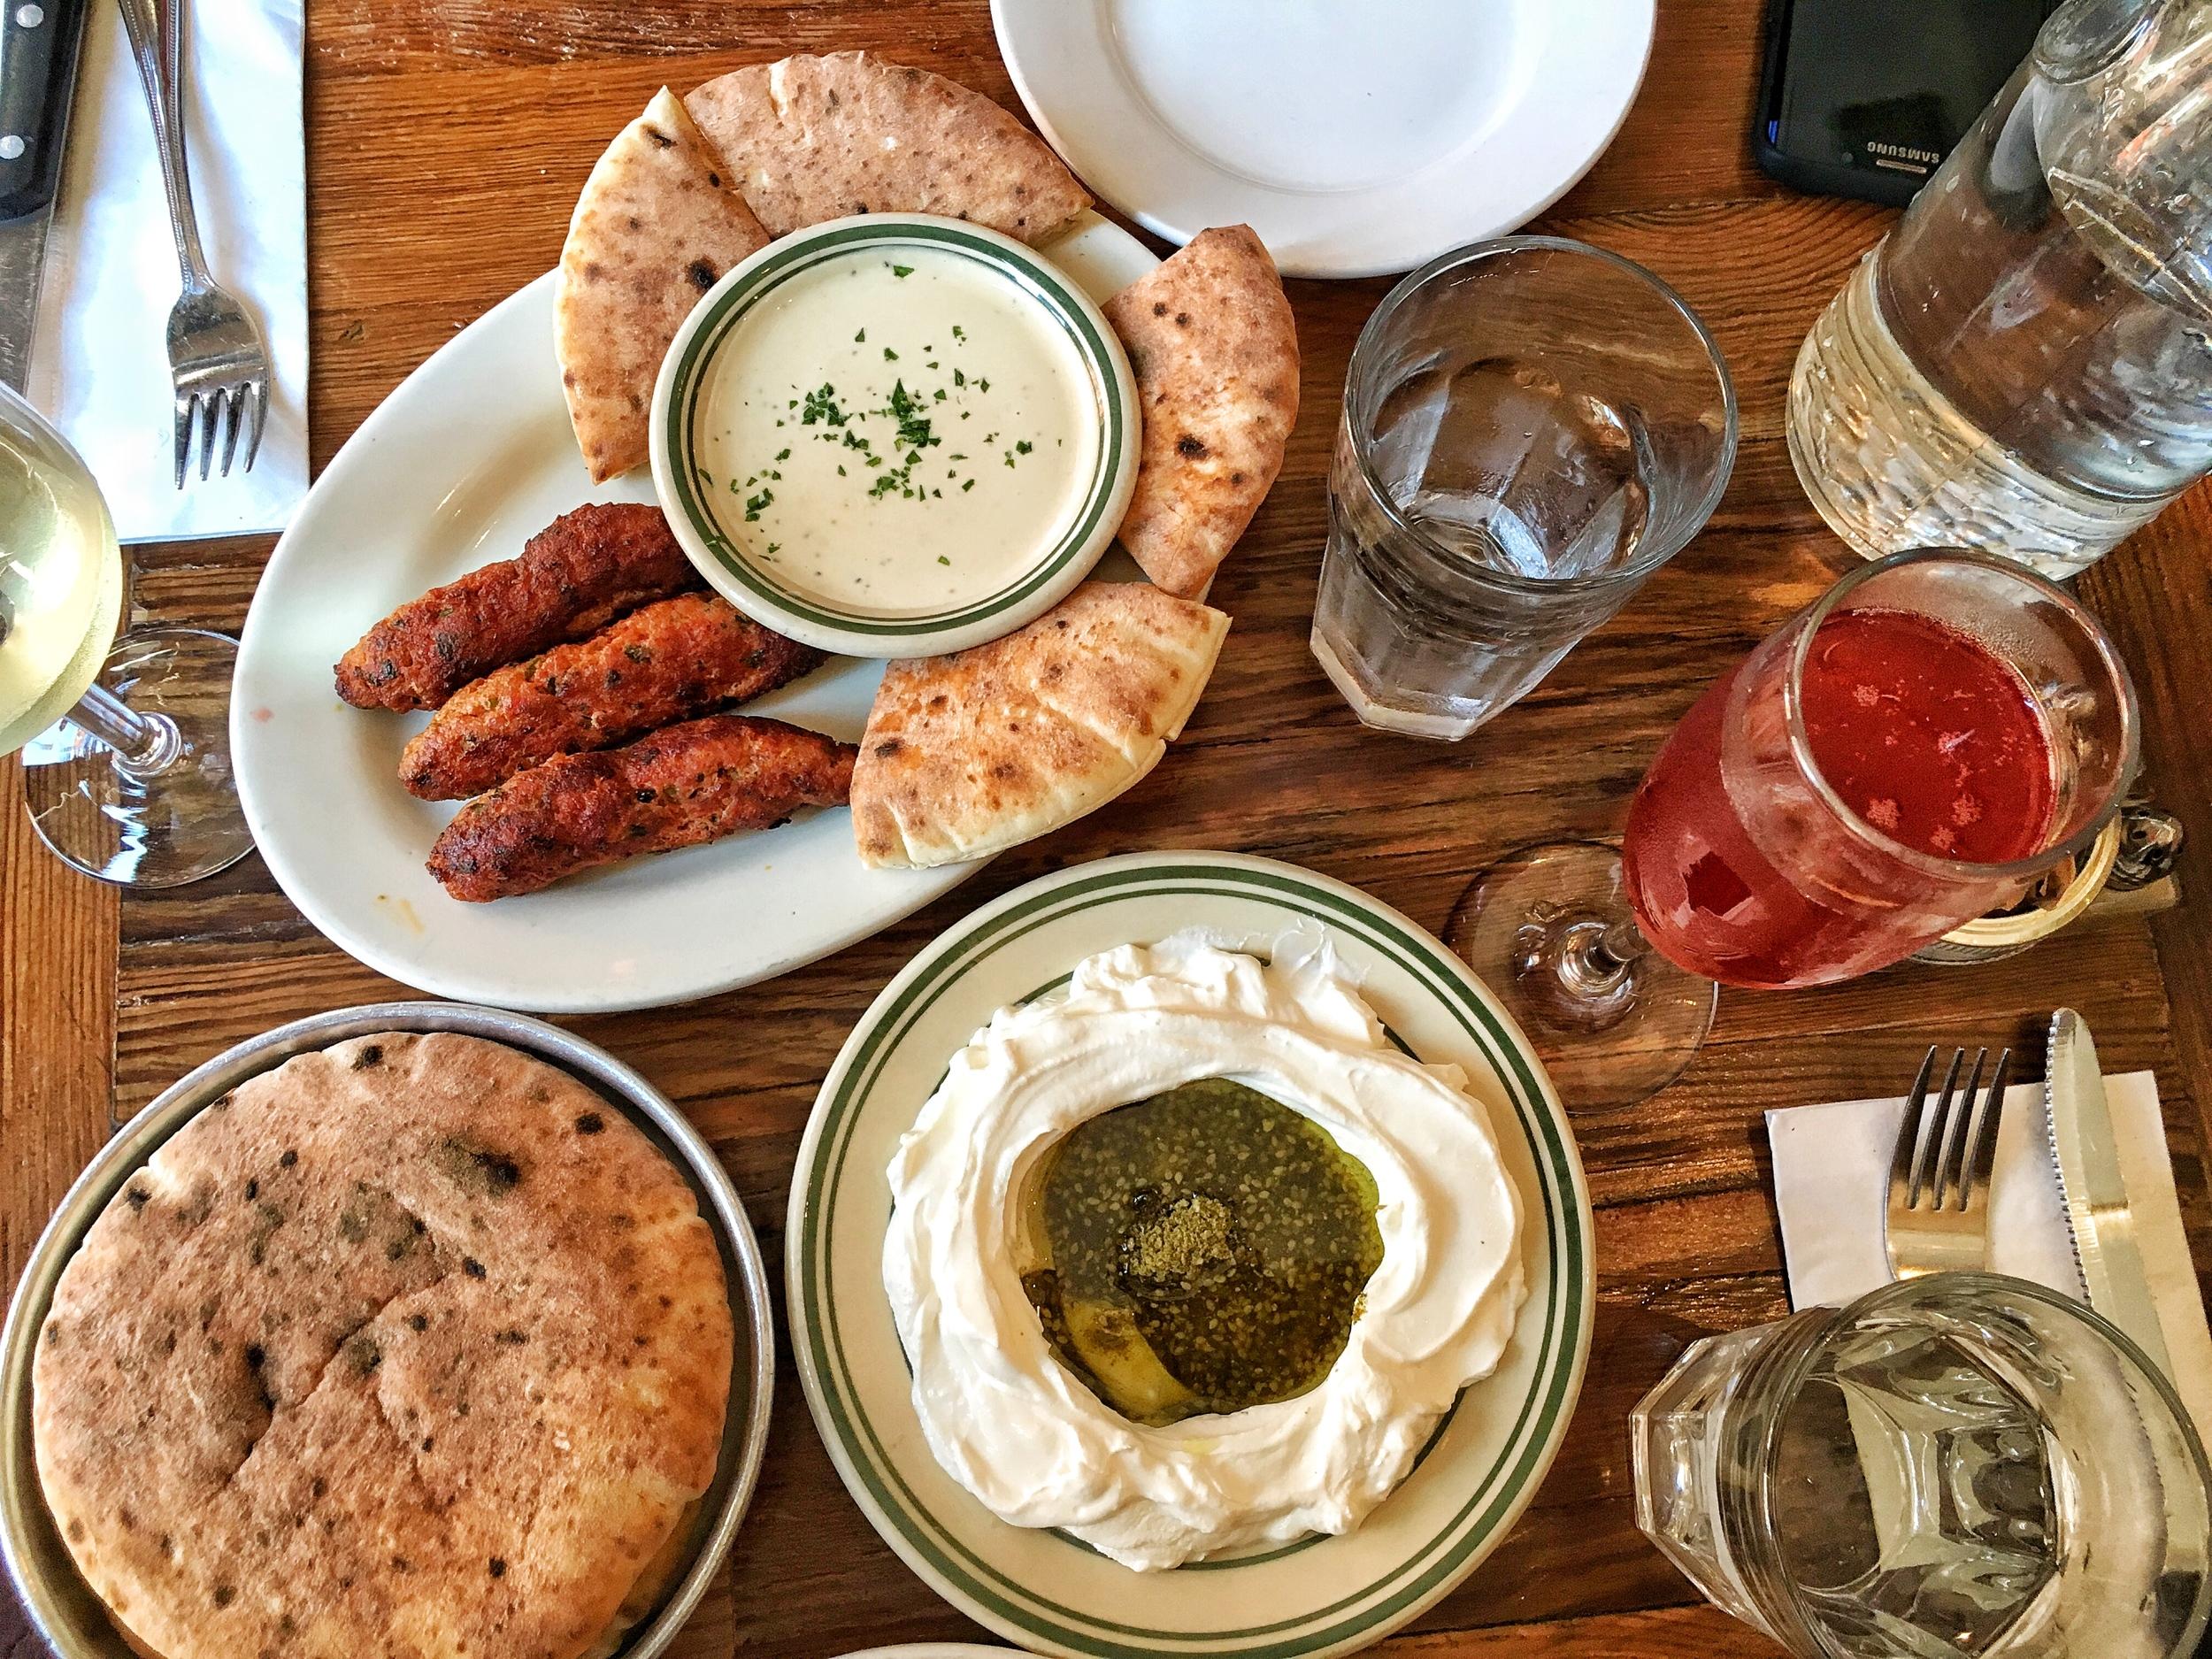 Labneh, warm freshly baked pita bread, lamb kebabs with tahini and pita, chardonnay, pomegranate mimosa